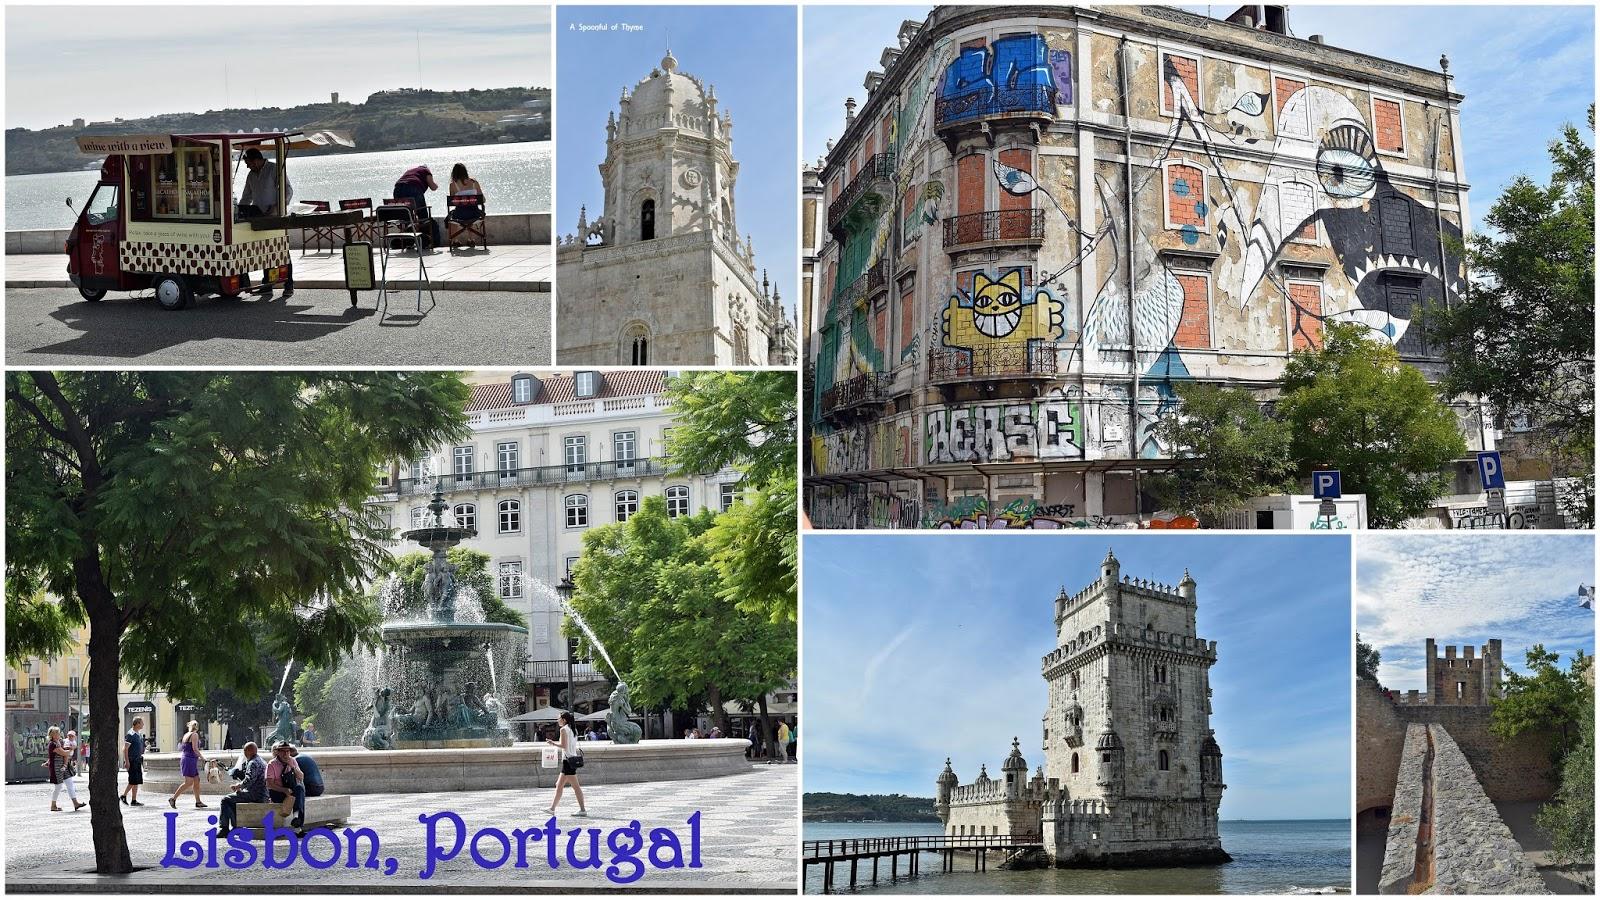 Lisbon portugal dating